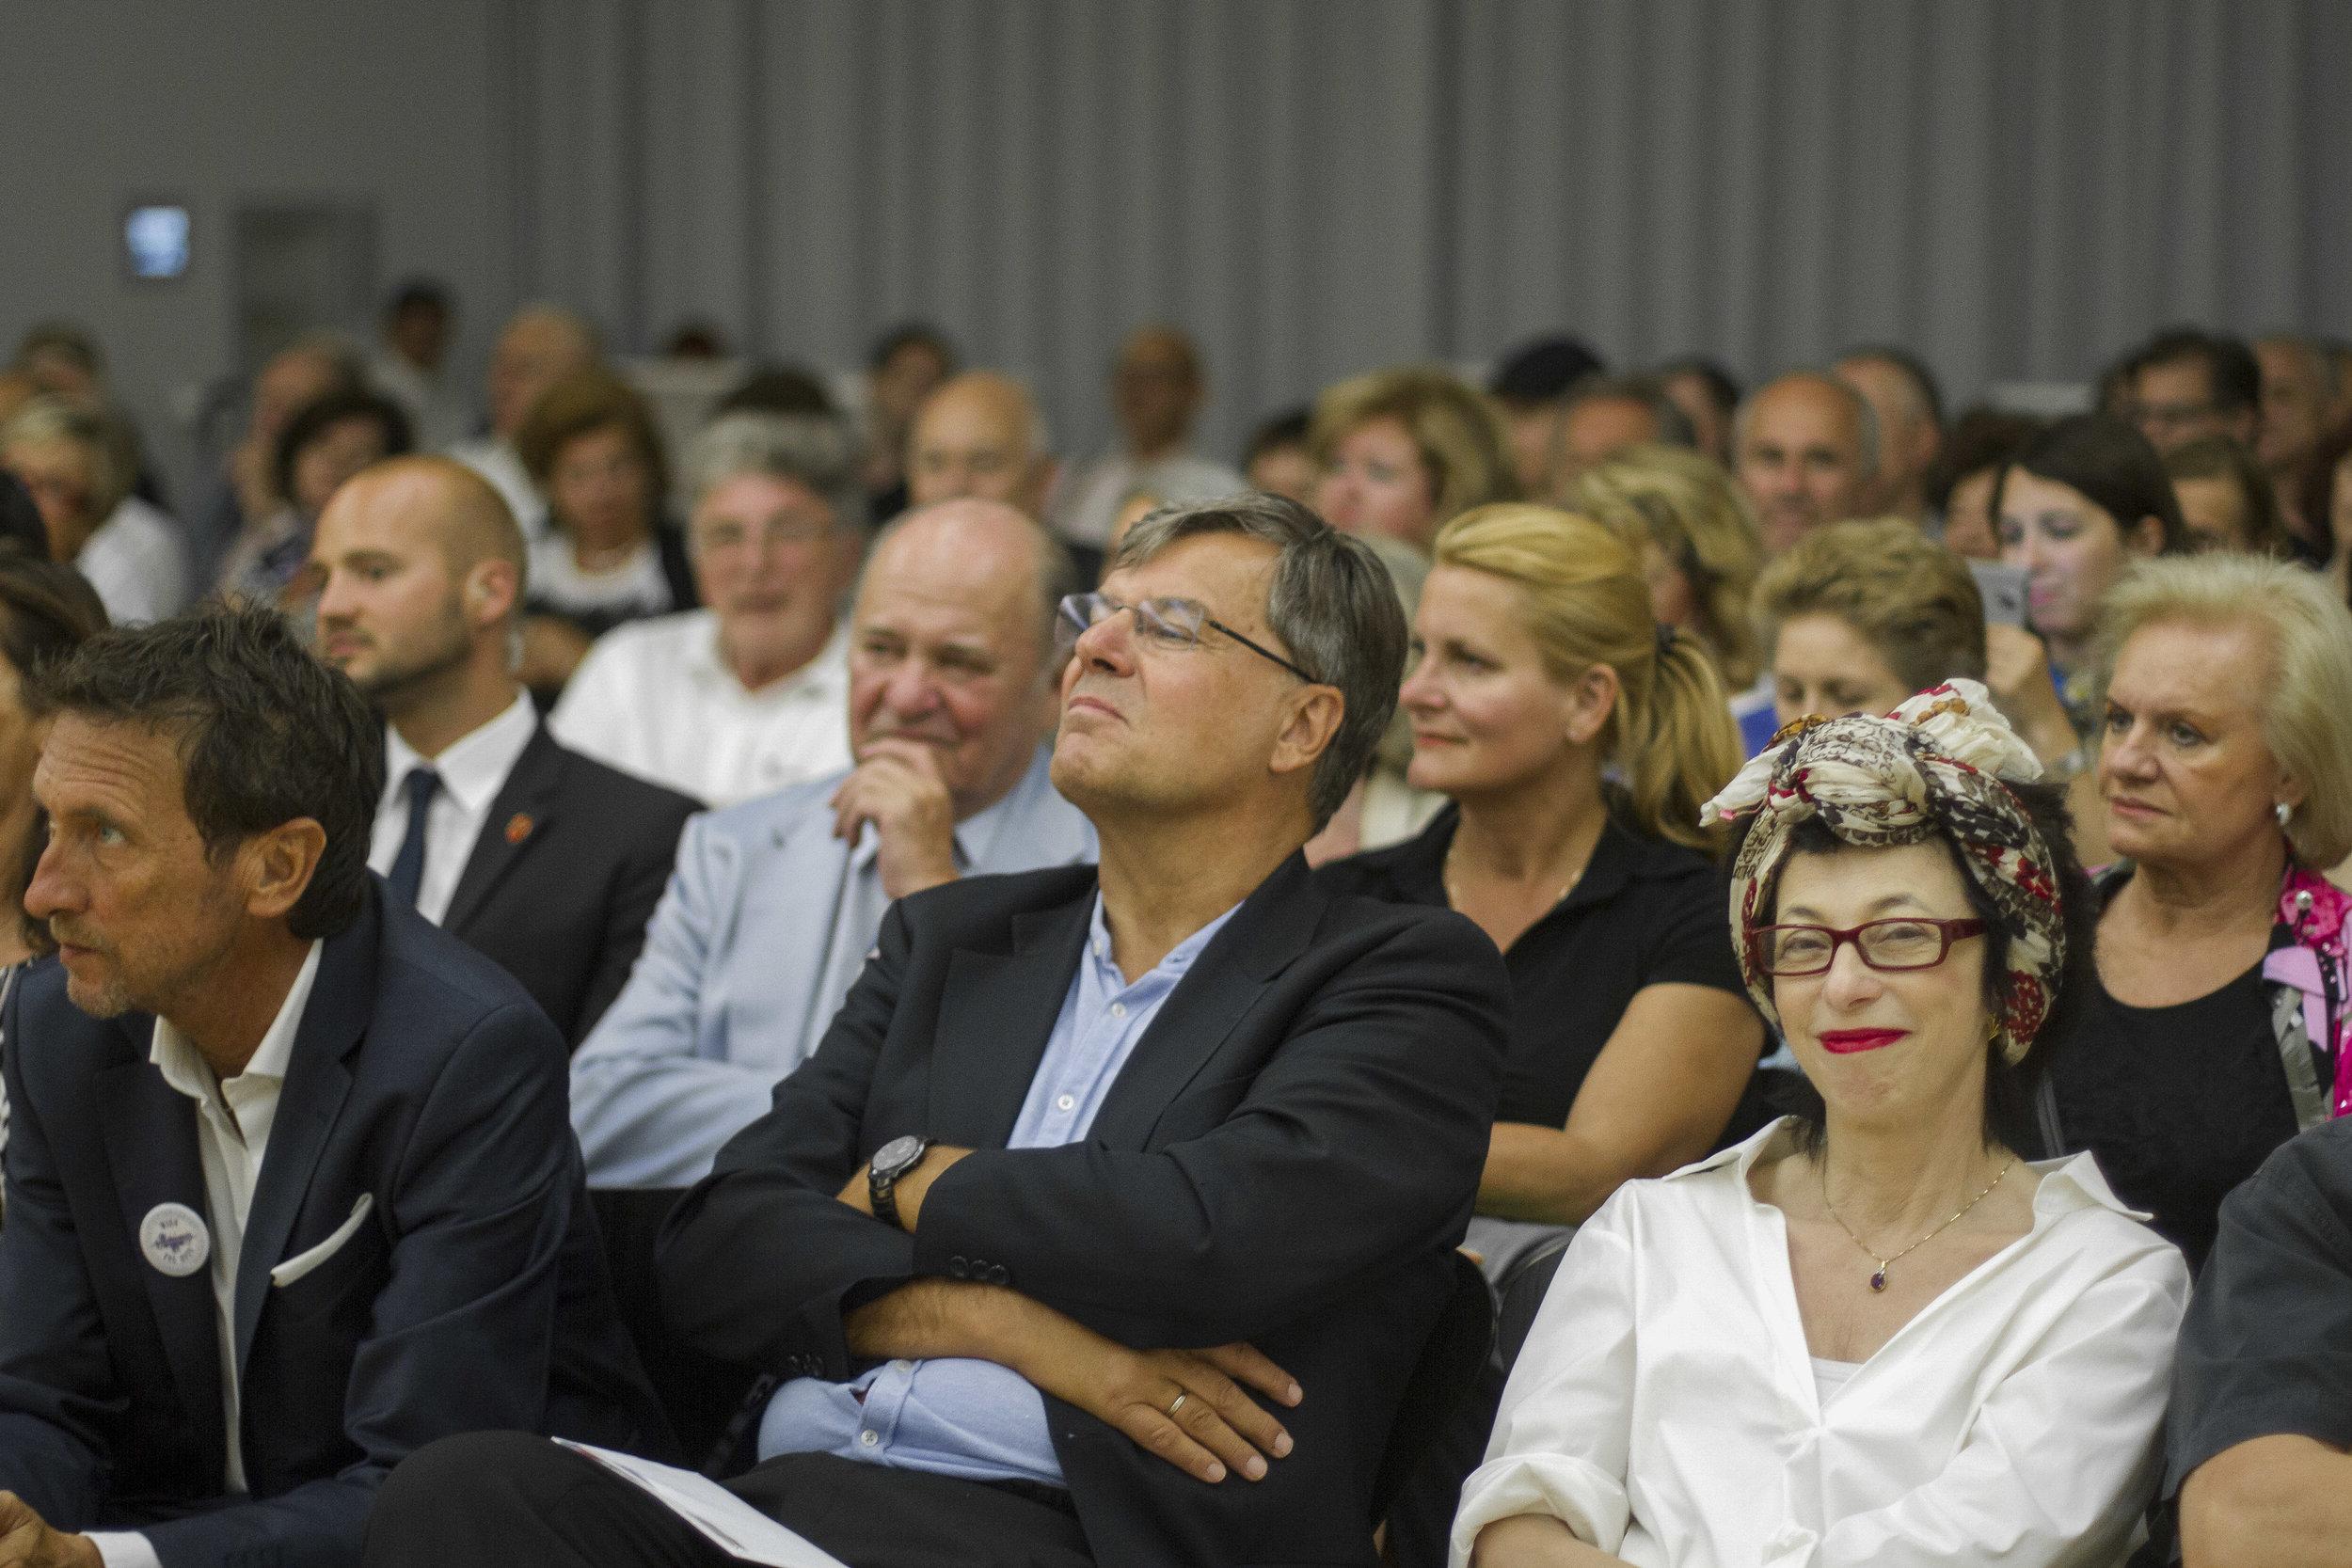 2016_06_29 Konzert Oberrabbiner (33).jpg